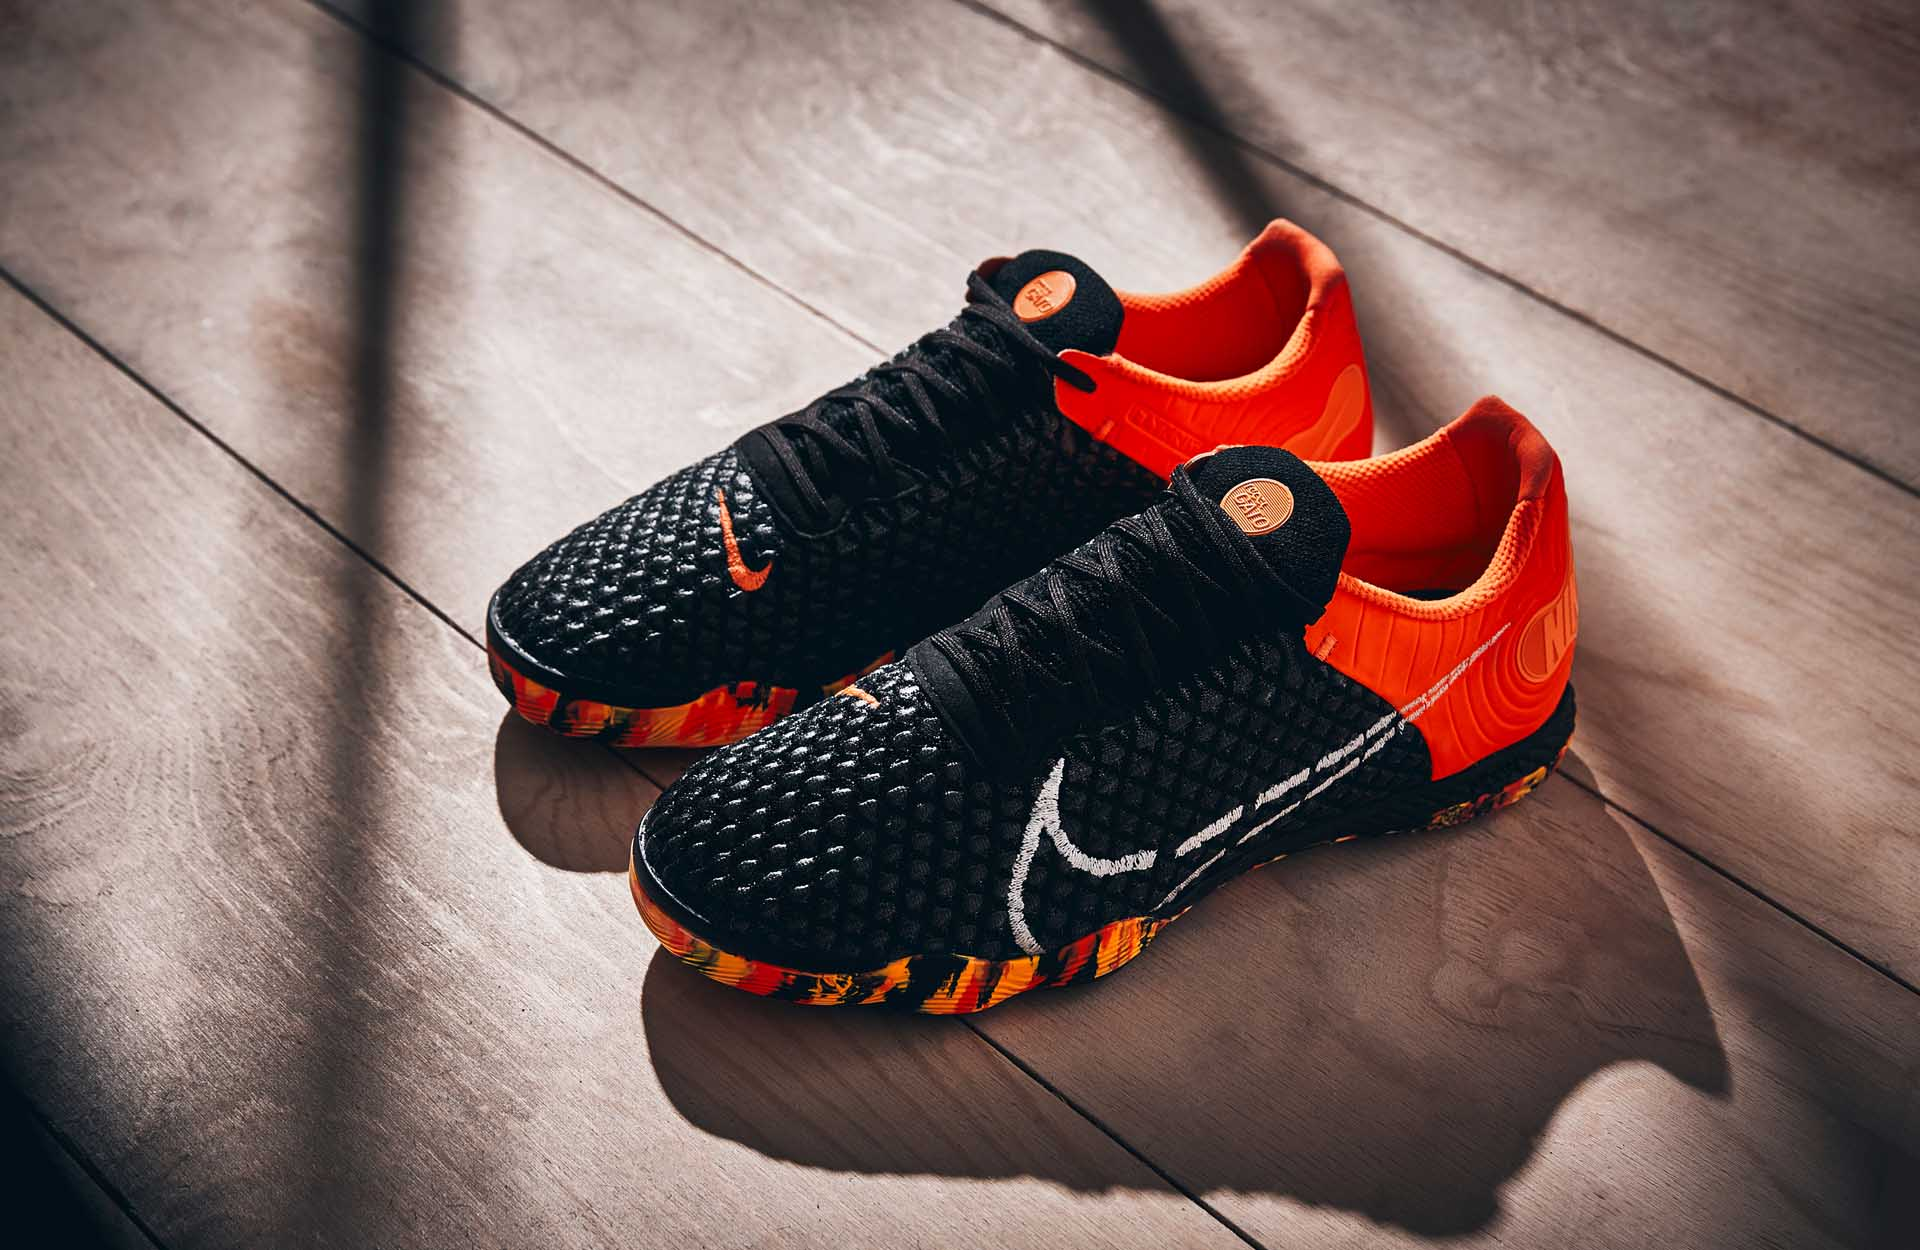 Nike Launch Fresh React Gato IC Colourway - SoccerBible